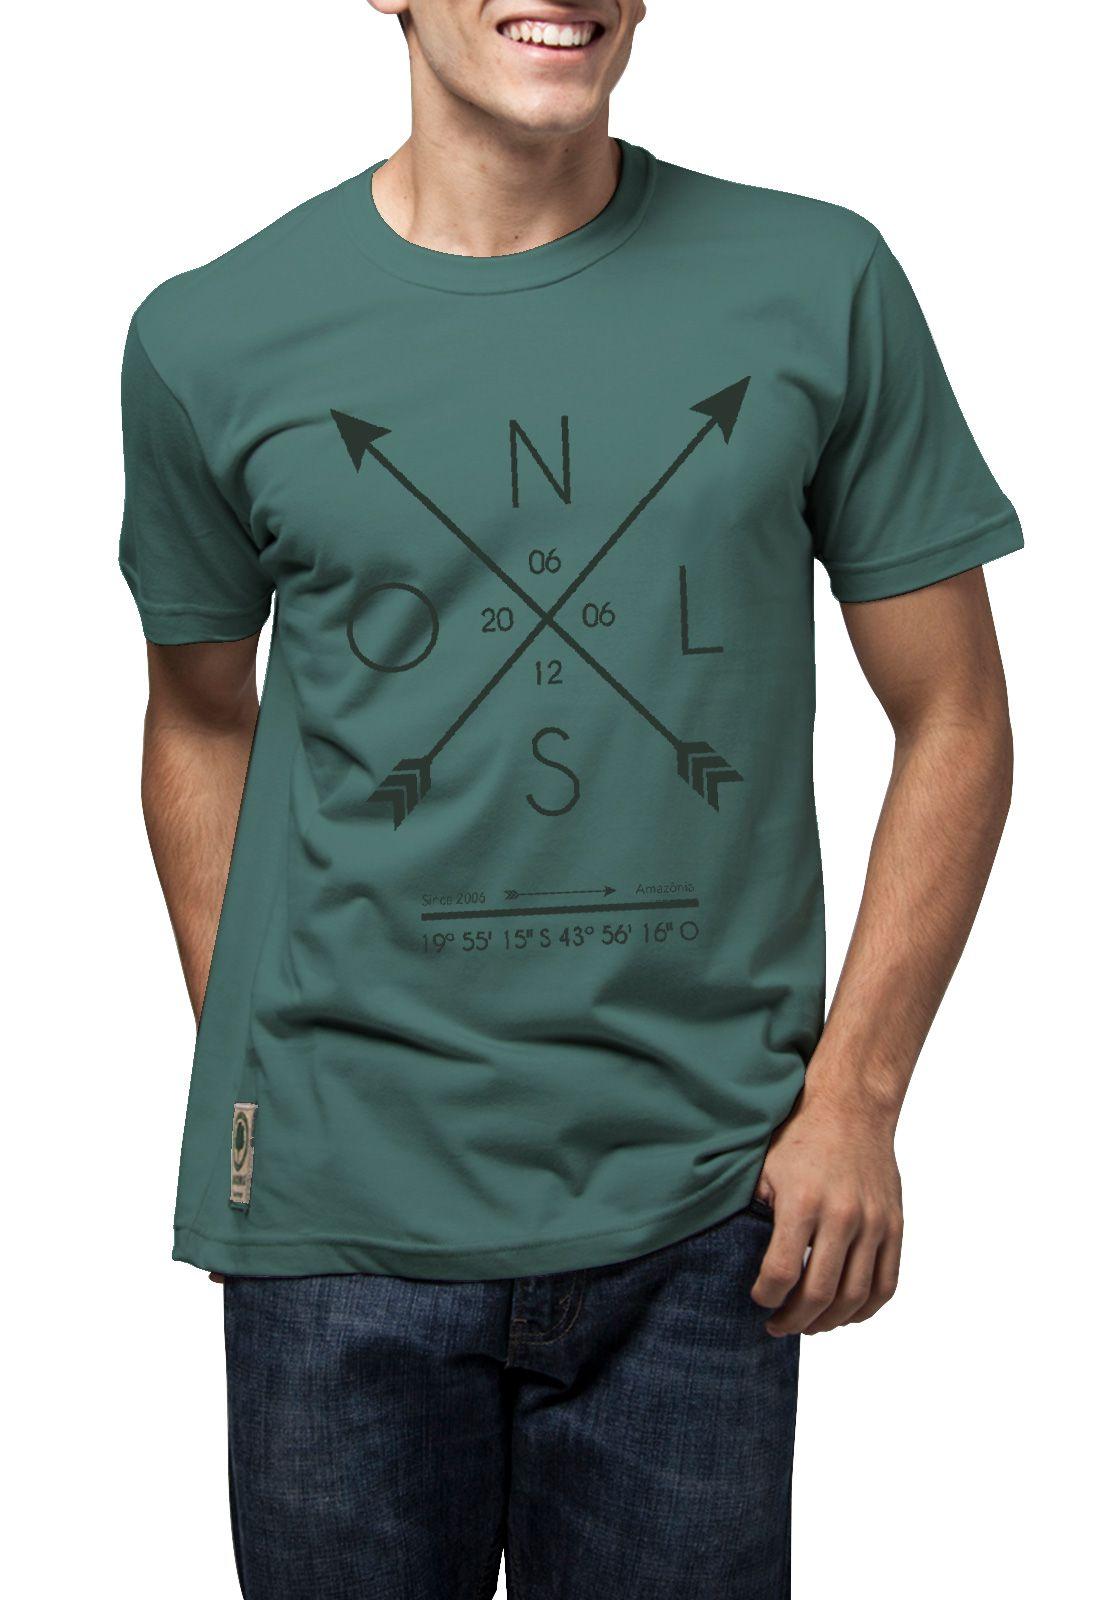 Camiseta Amazônia Since 2006 - Cinza